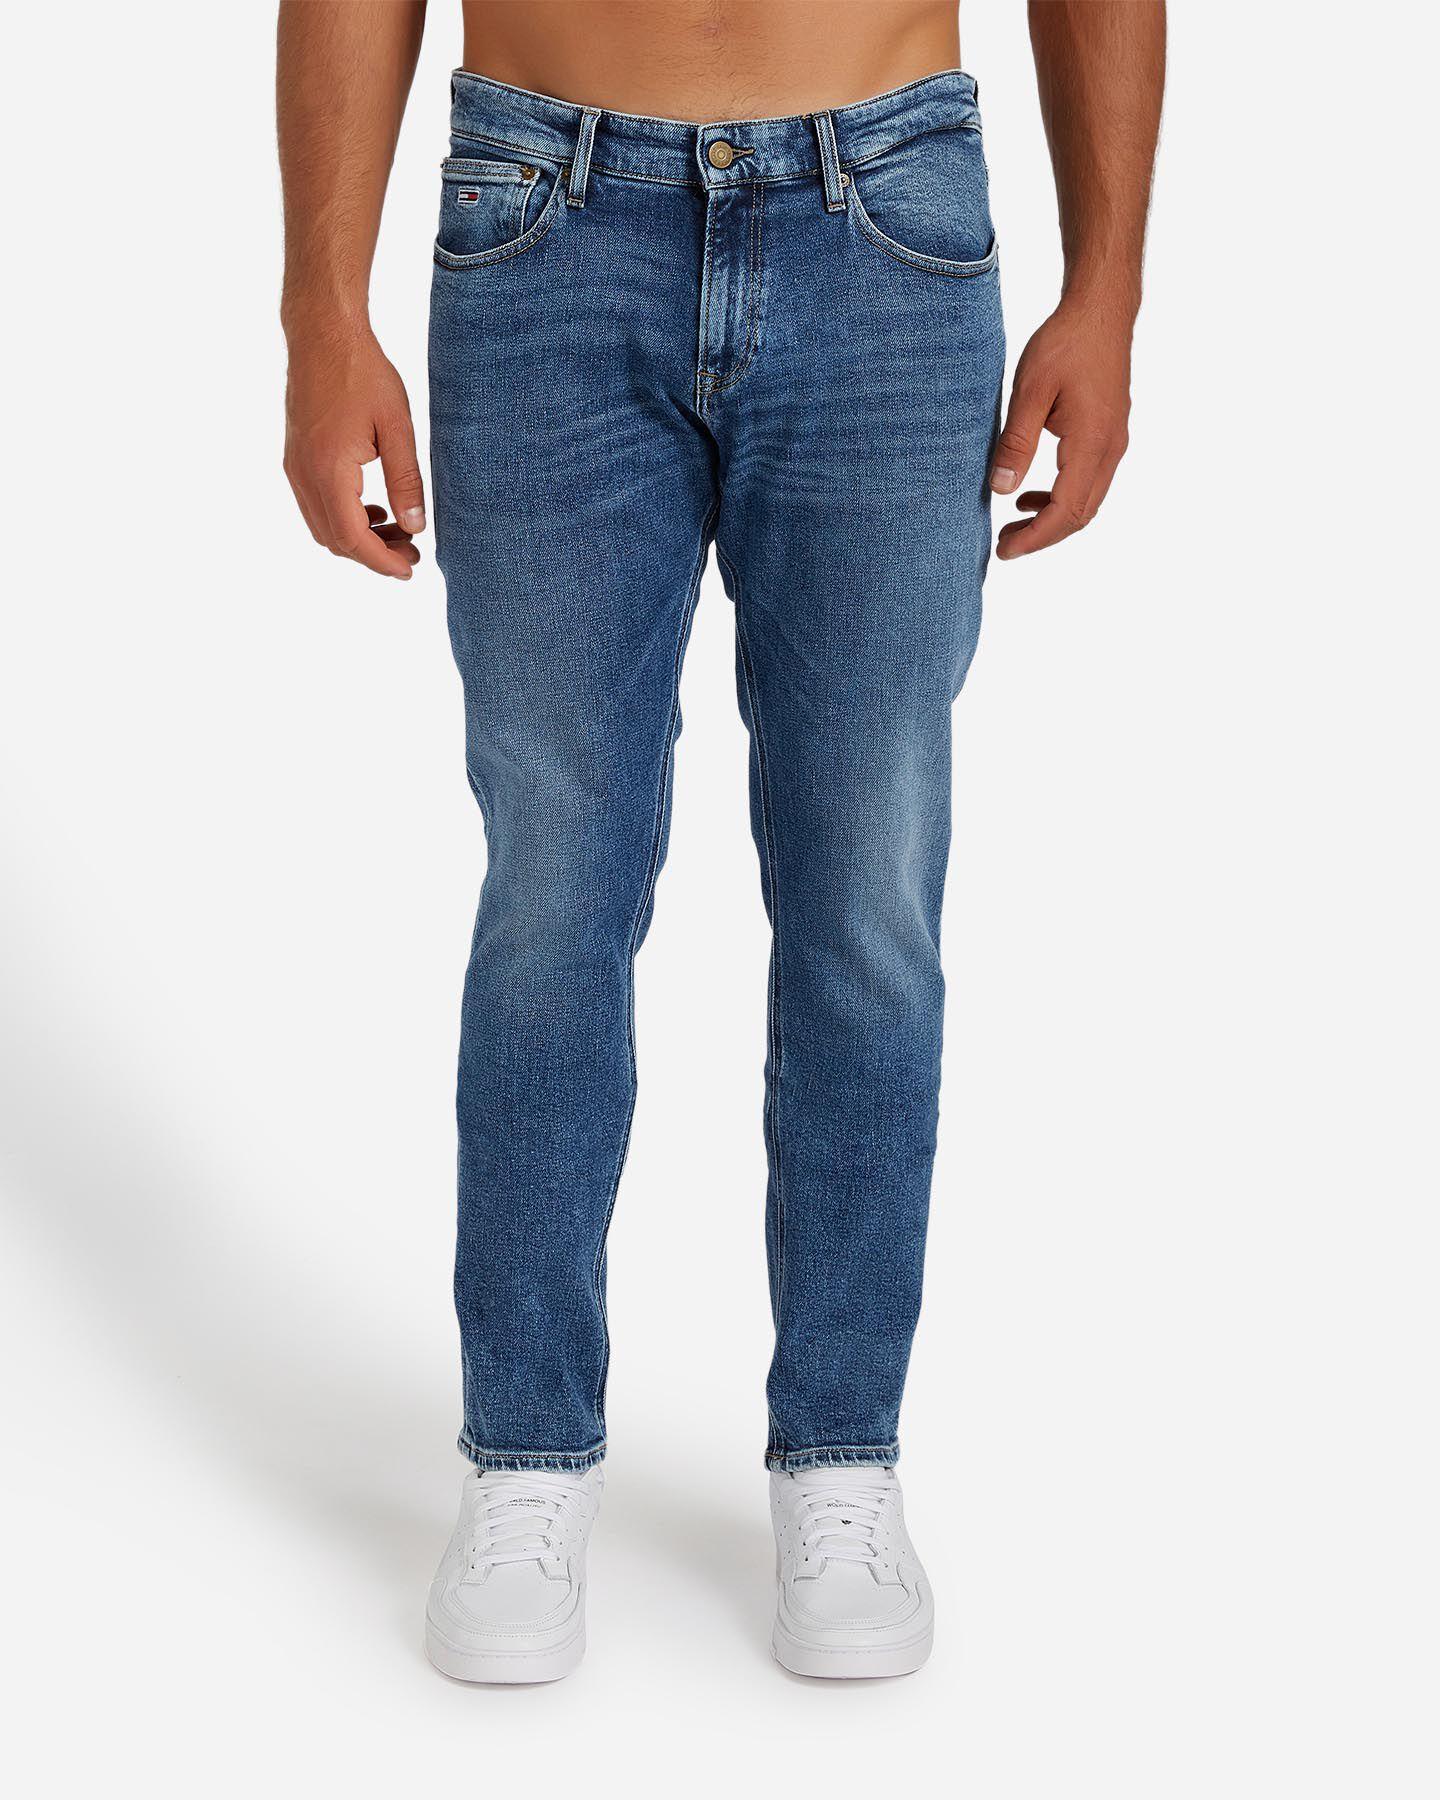 Jeans TOMMY HILFIGER SCANTON SLIM M S4082052 scatto 0